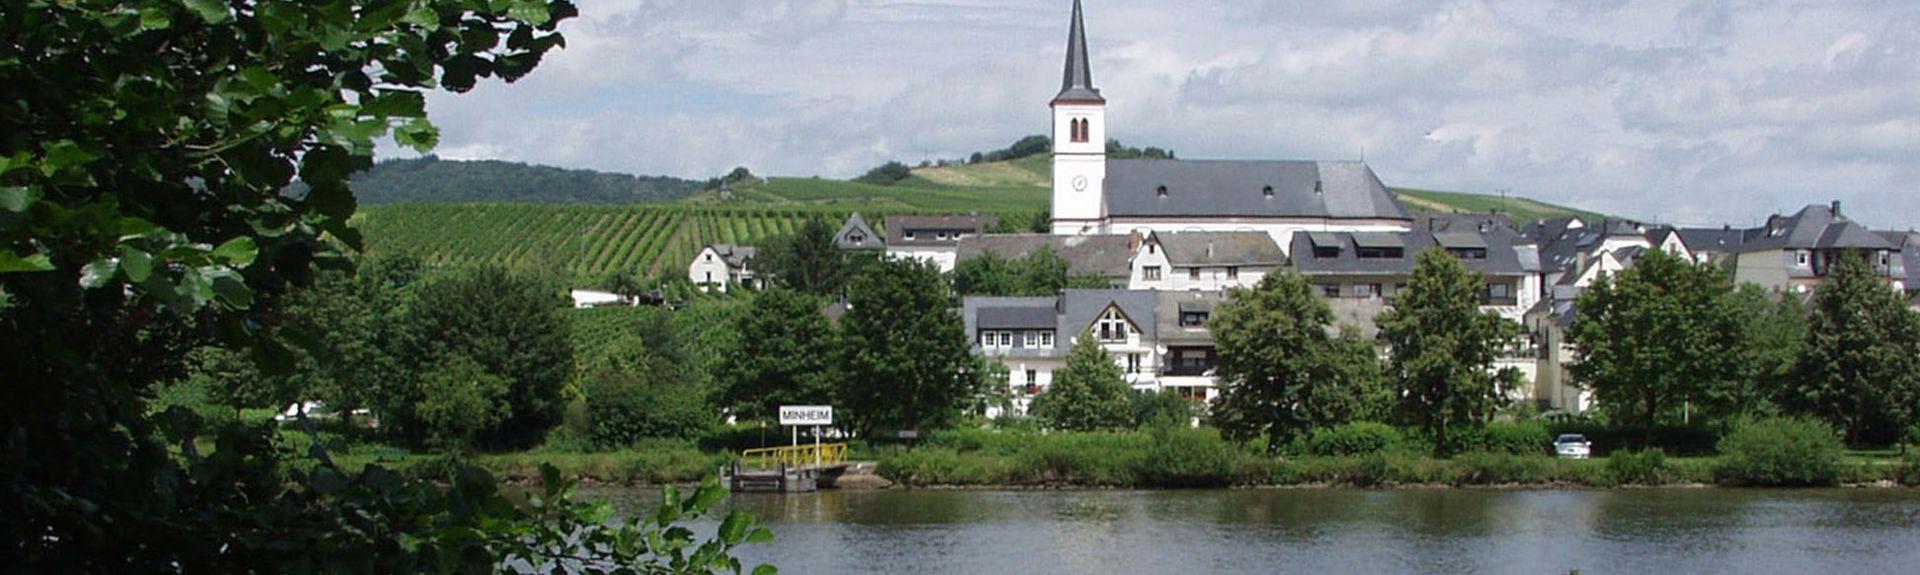 Osann-Monzel, Renânia-Palatinado, Alemanha